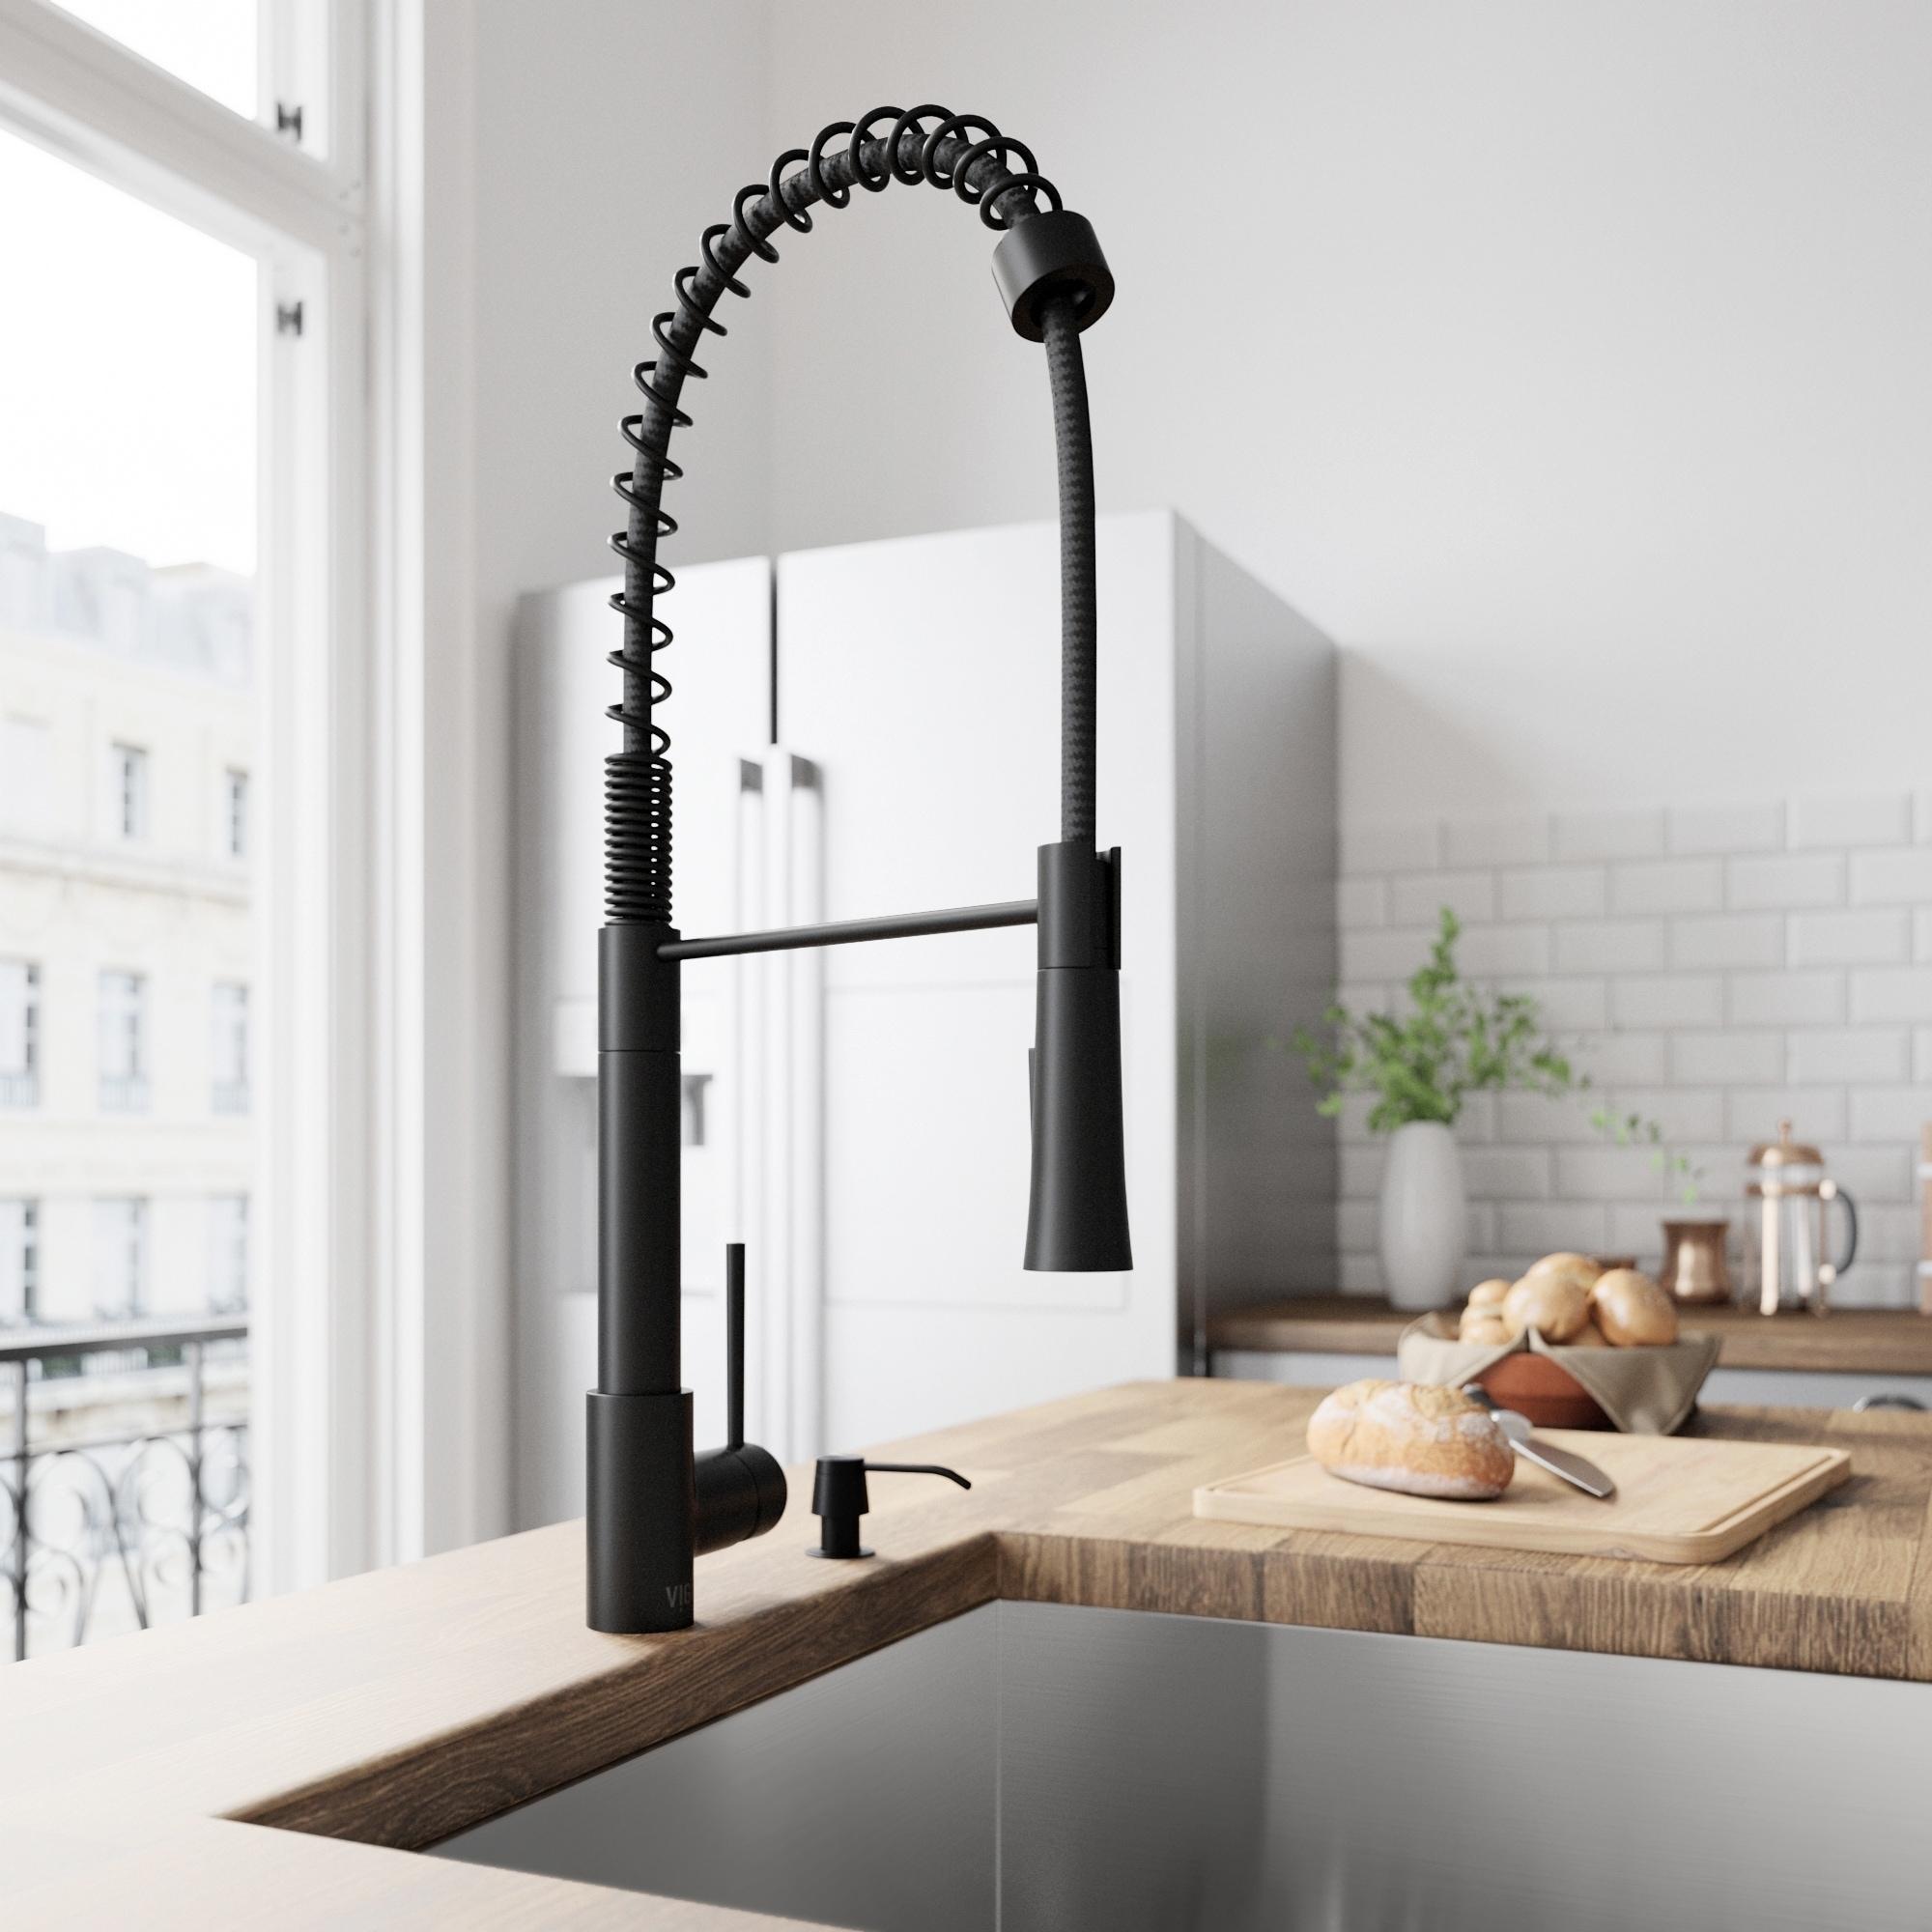 Vigo Laurelton Pull Down Spray Kitchen Faucet In Matte Black vigo laurelton matte black pull-down spray kitchen faucet